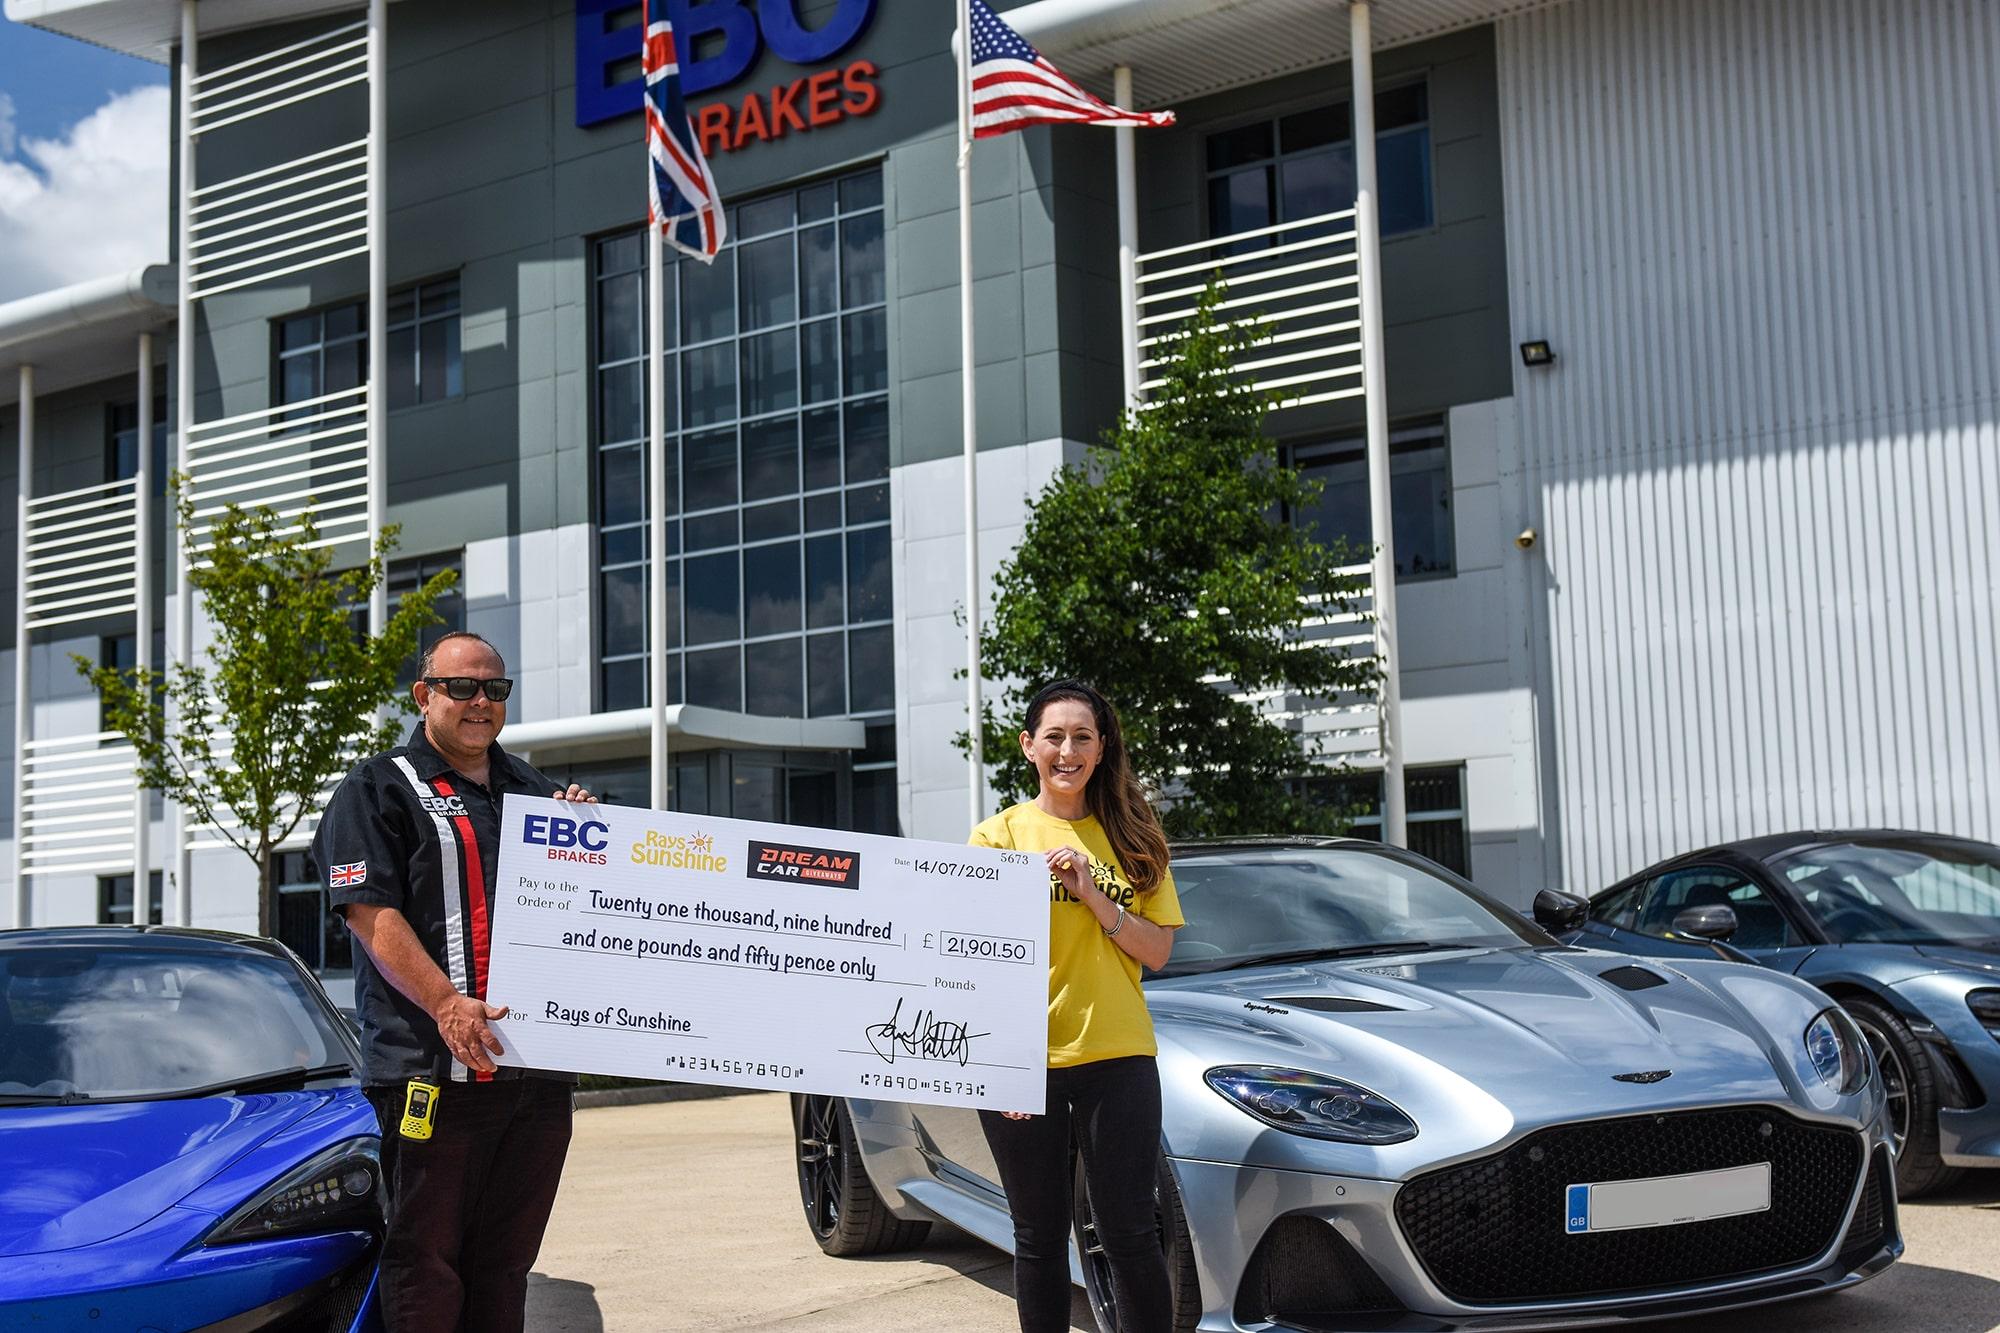 EBC Brakes' 'Ultimate Fiesta Build' Raises Over £21,000 for Charity